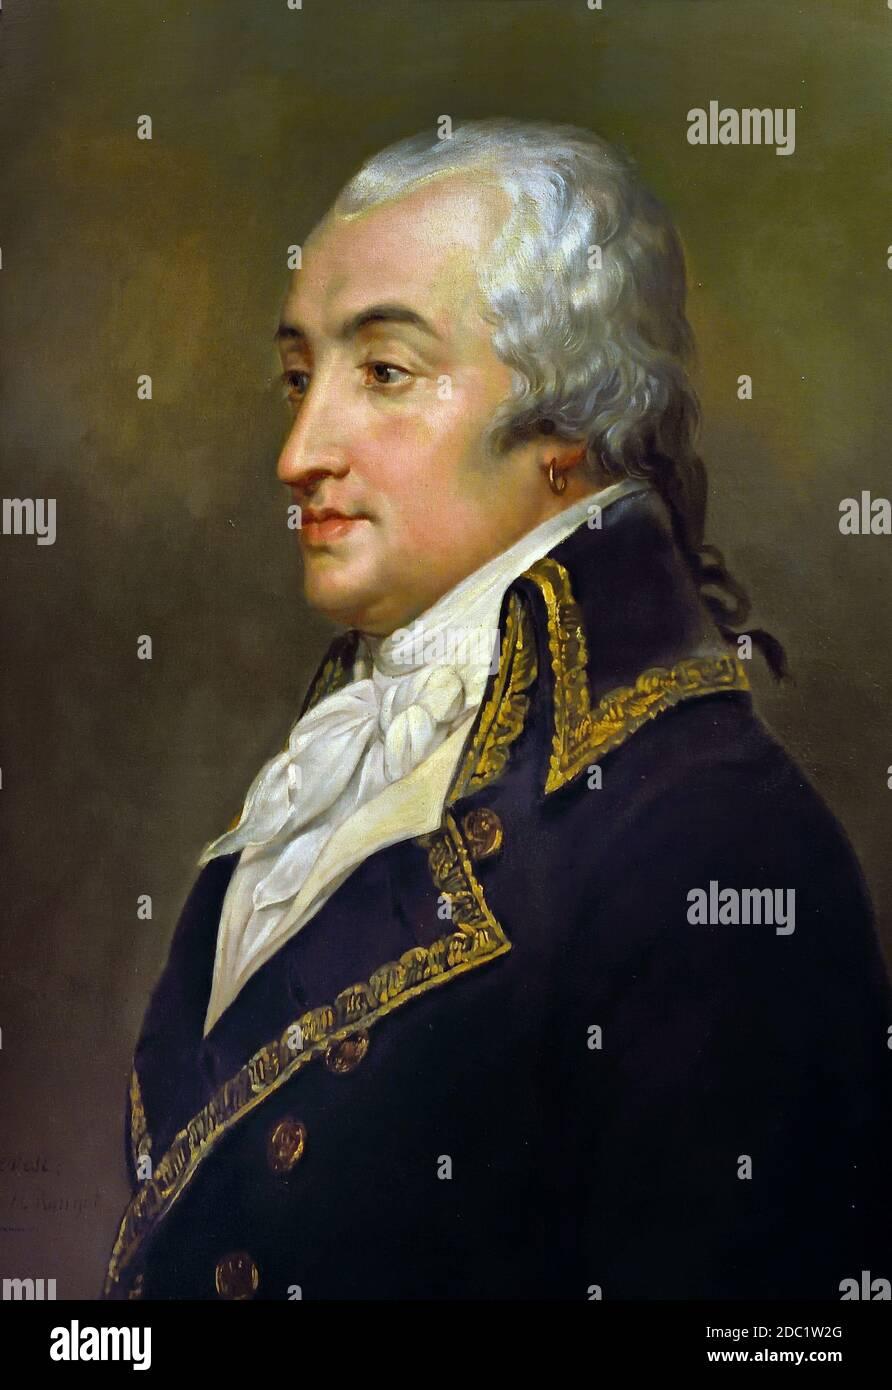 Duke Armand Louis de Gontaut de Biron 1747-1793 Francia, francés ( Armand Louis de Gontaut, duque de Lauzun, y duque de Biron ), Foto de stock